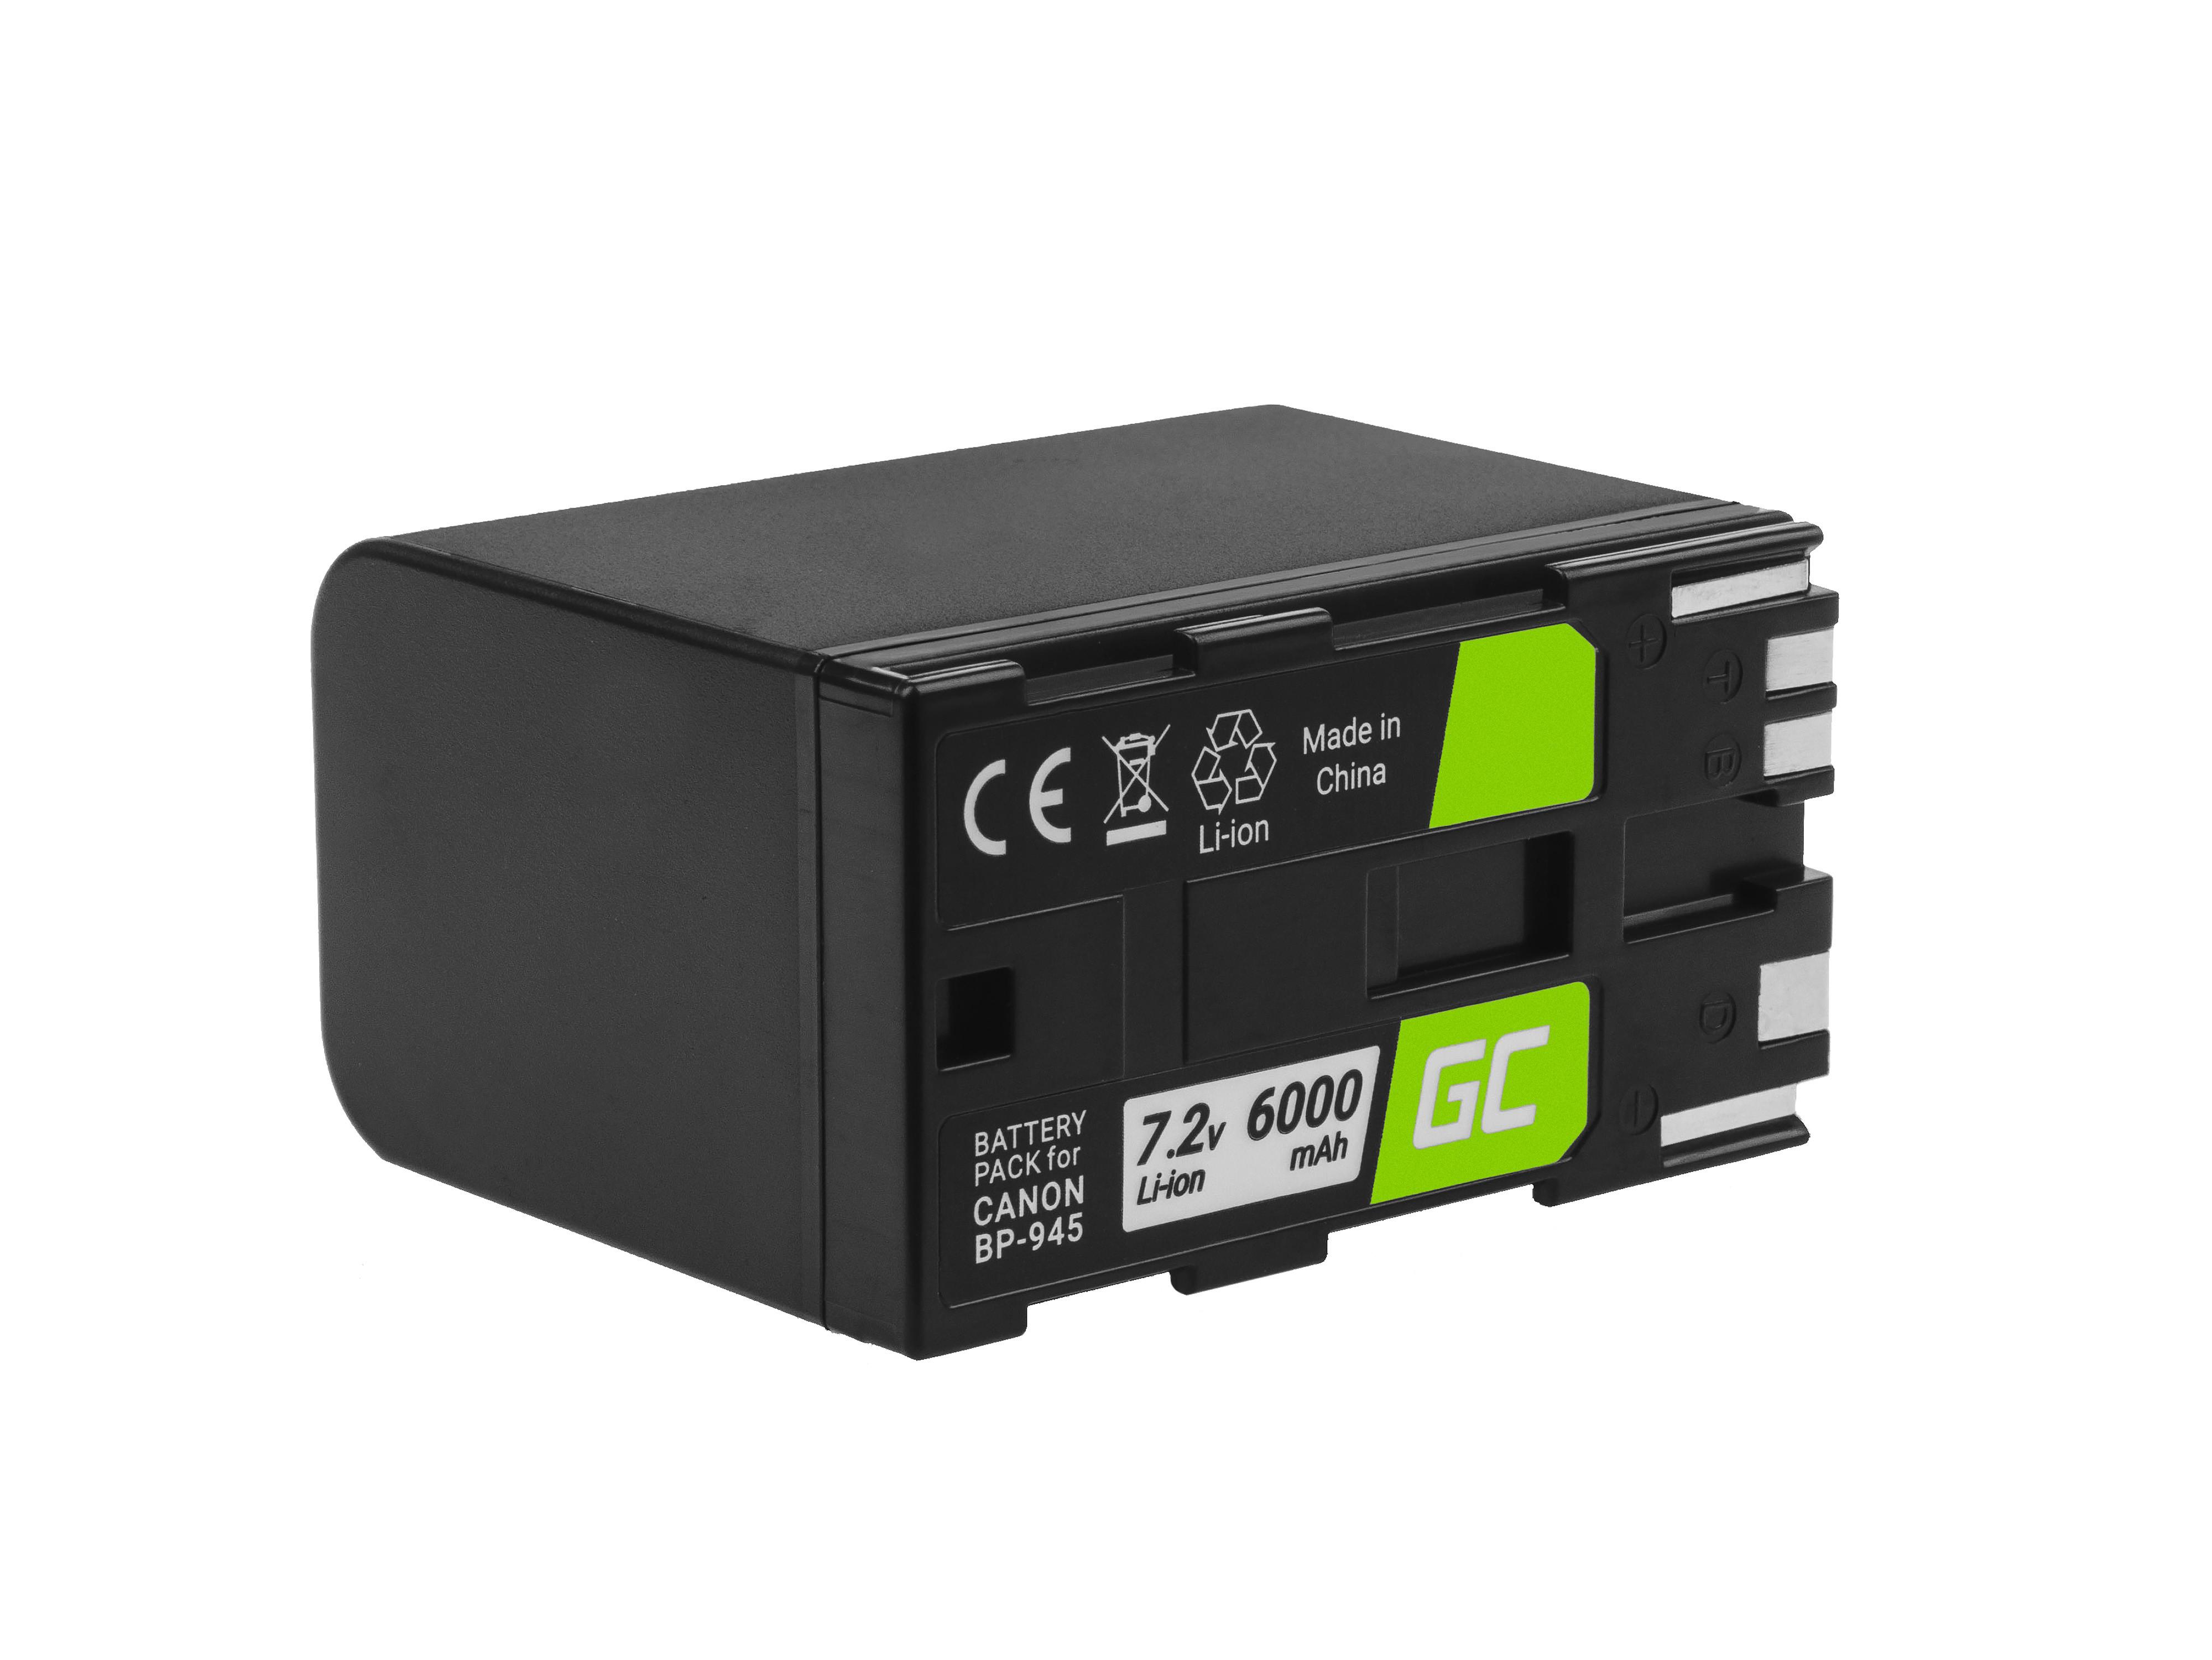 Baterie Green Cell Canon BP-80 BP-941 BP-945, pro Canon DM-XL1, ES5000, XL1 7.2V 6000mAh Li-ion - neoriginální